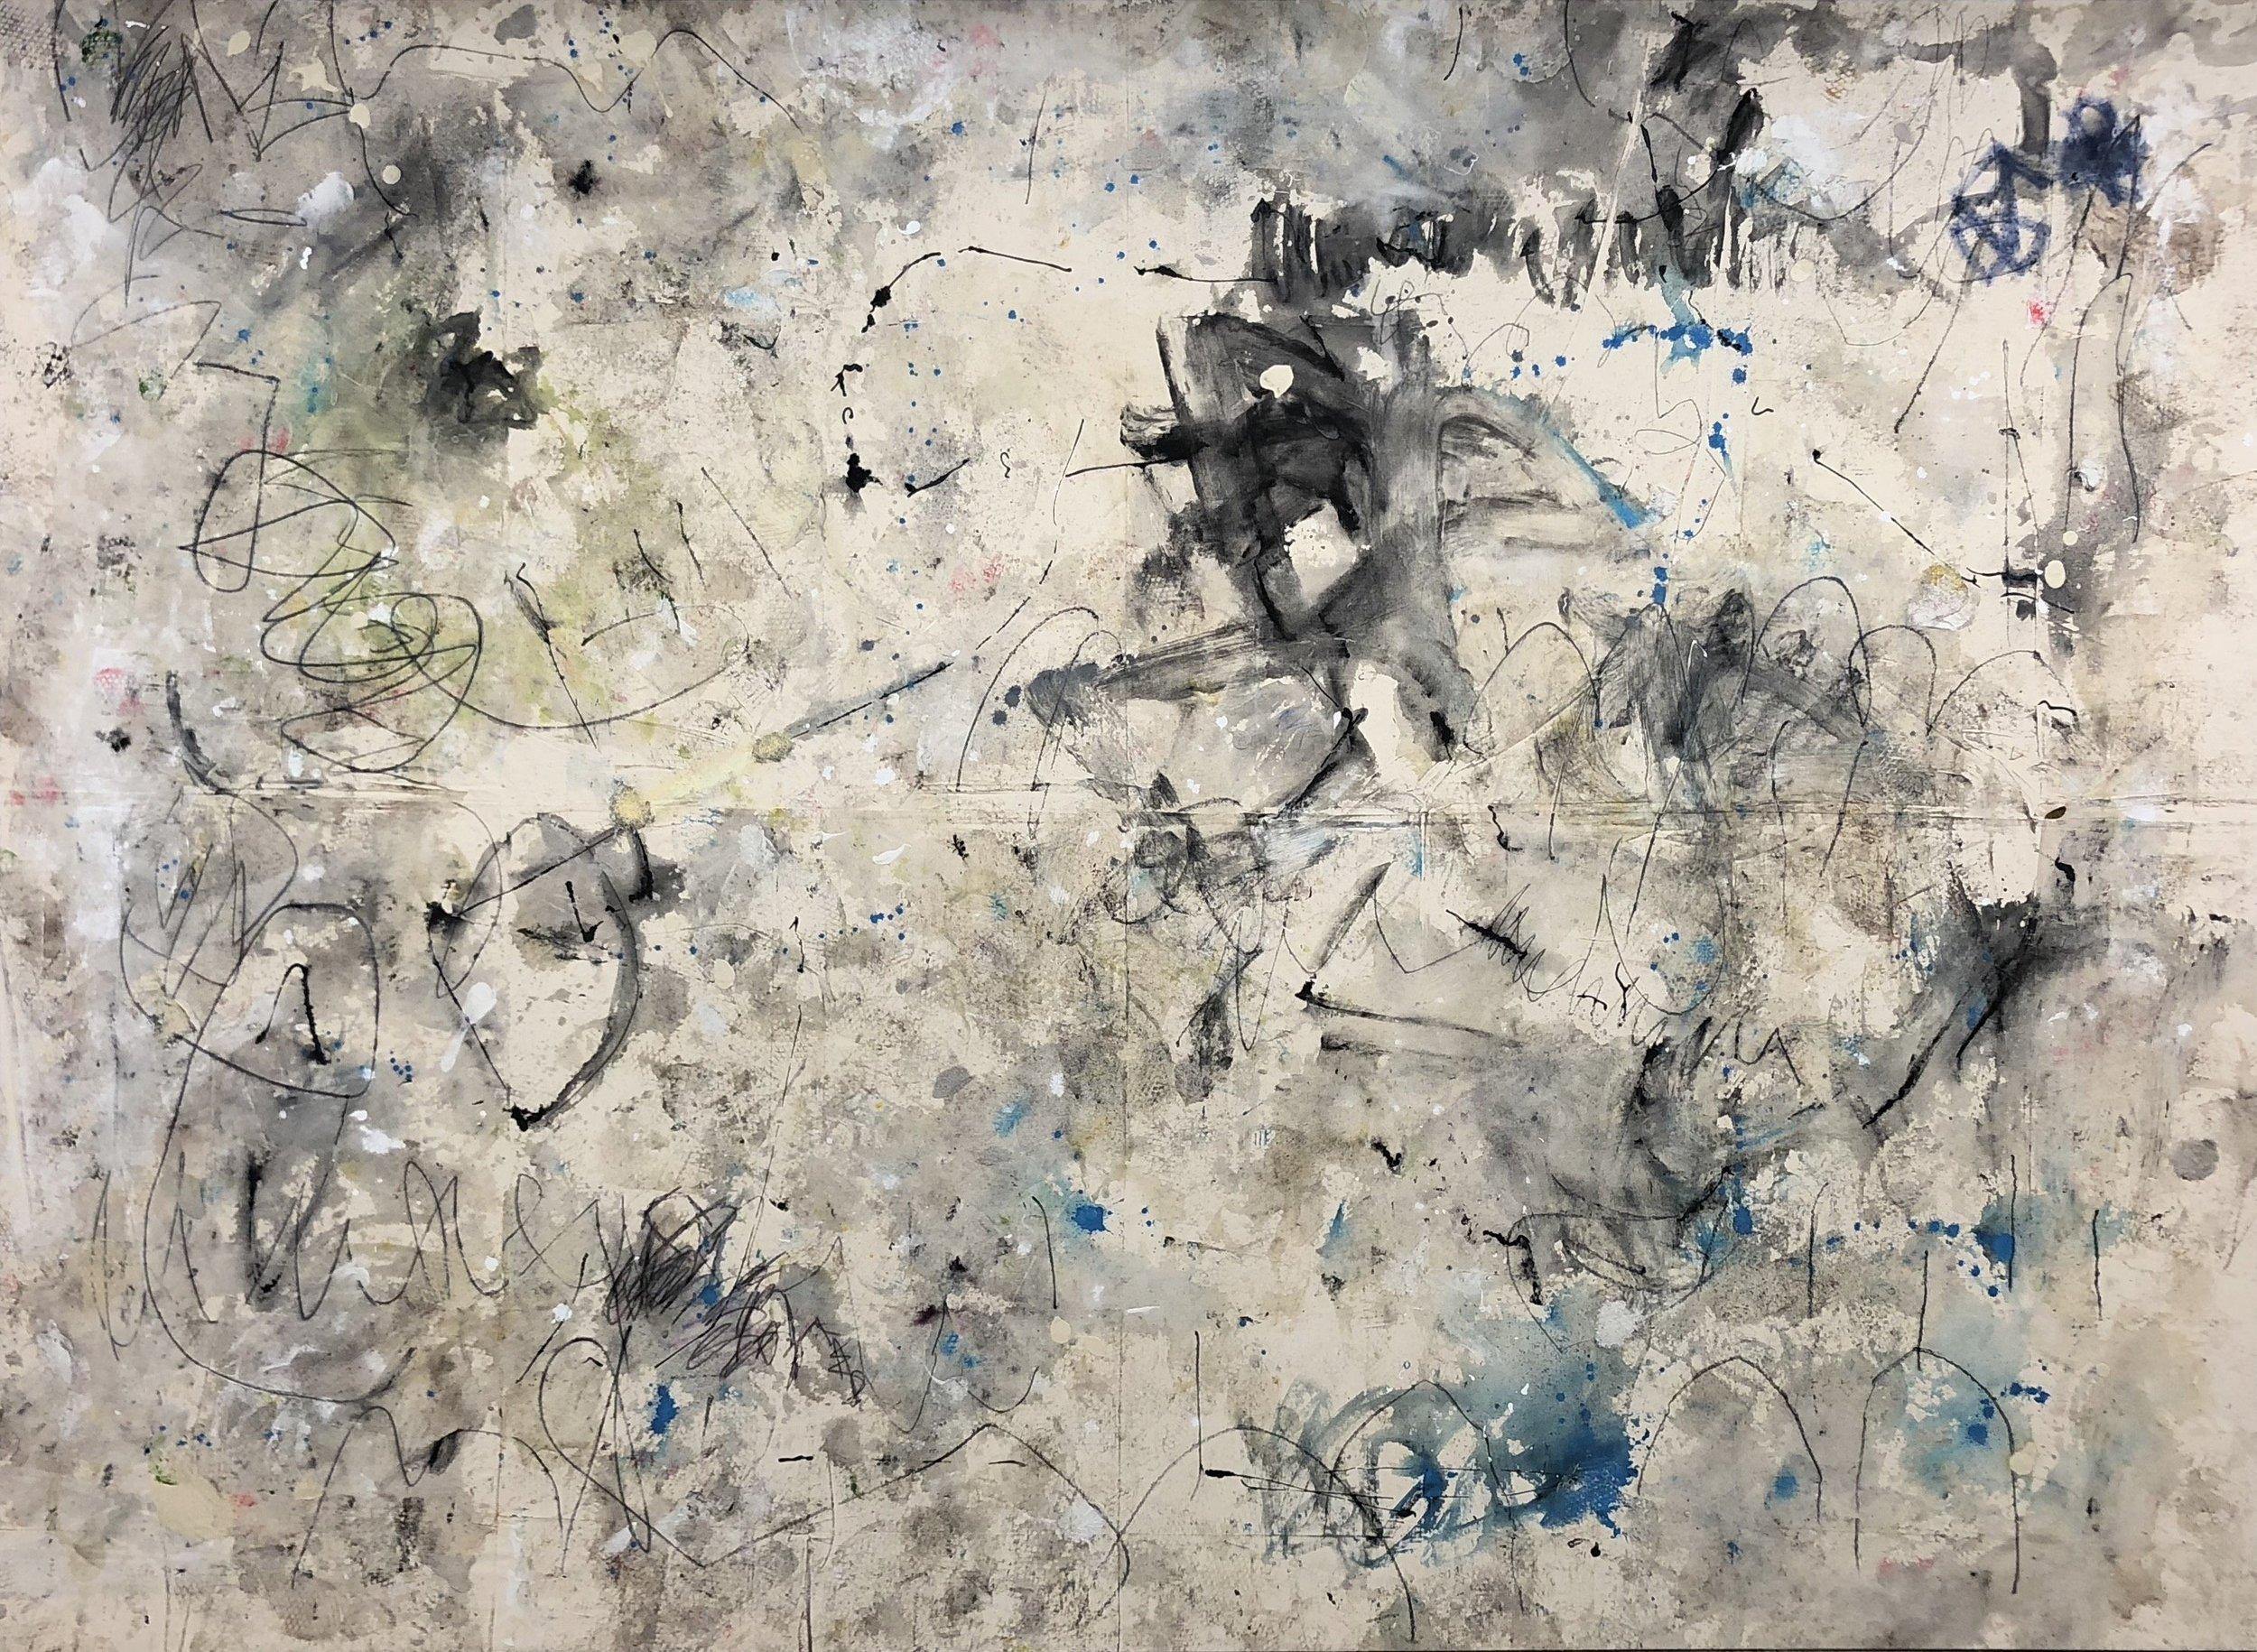 Kimberly Rowe, Origin, 2018,Charcoal, acrylic, sand, gel medium, ink on canvas,235 (H) x 322cm (W)